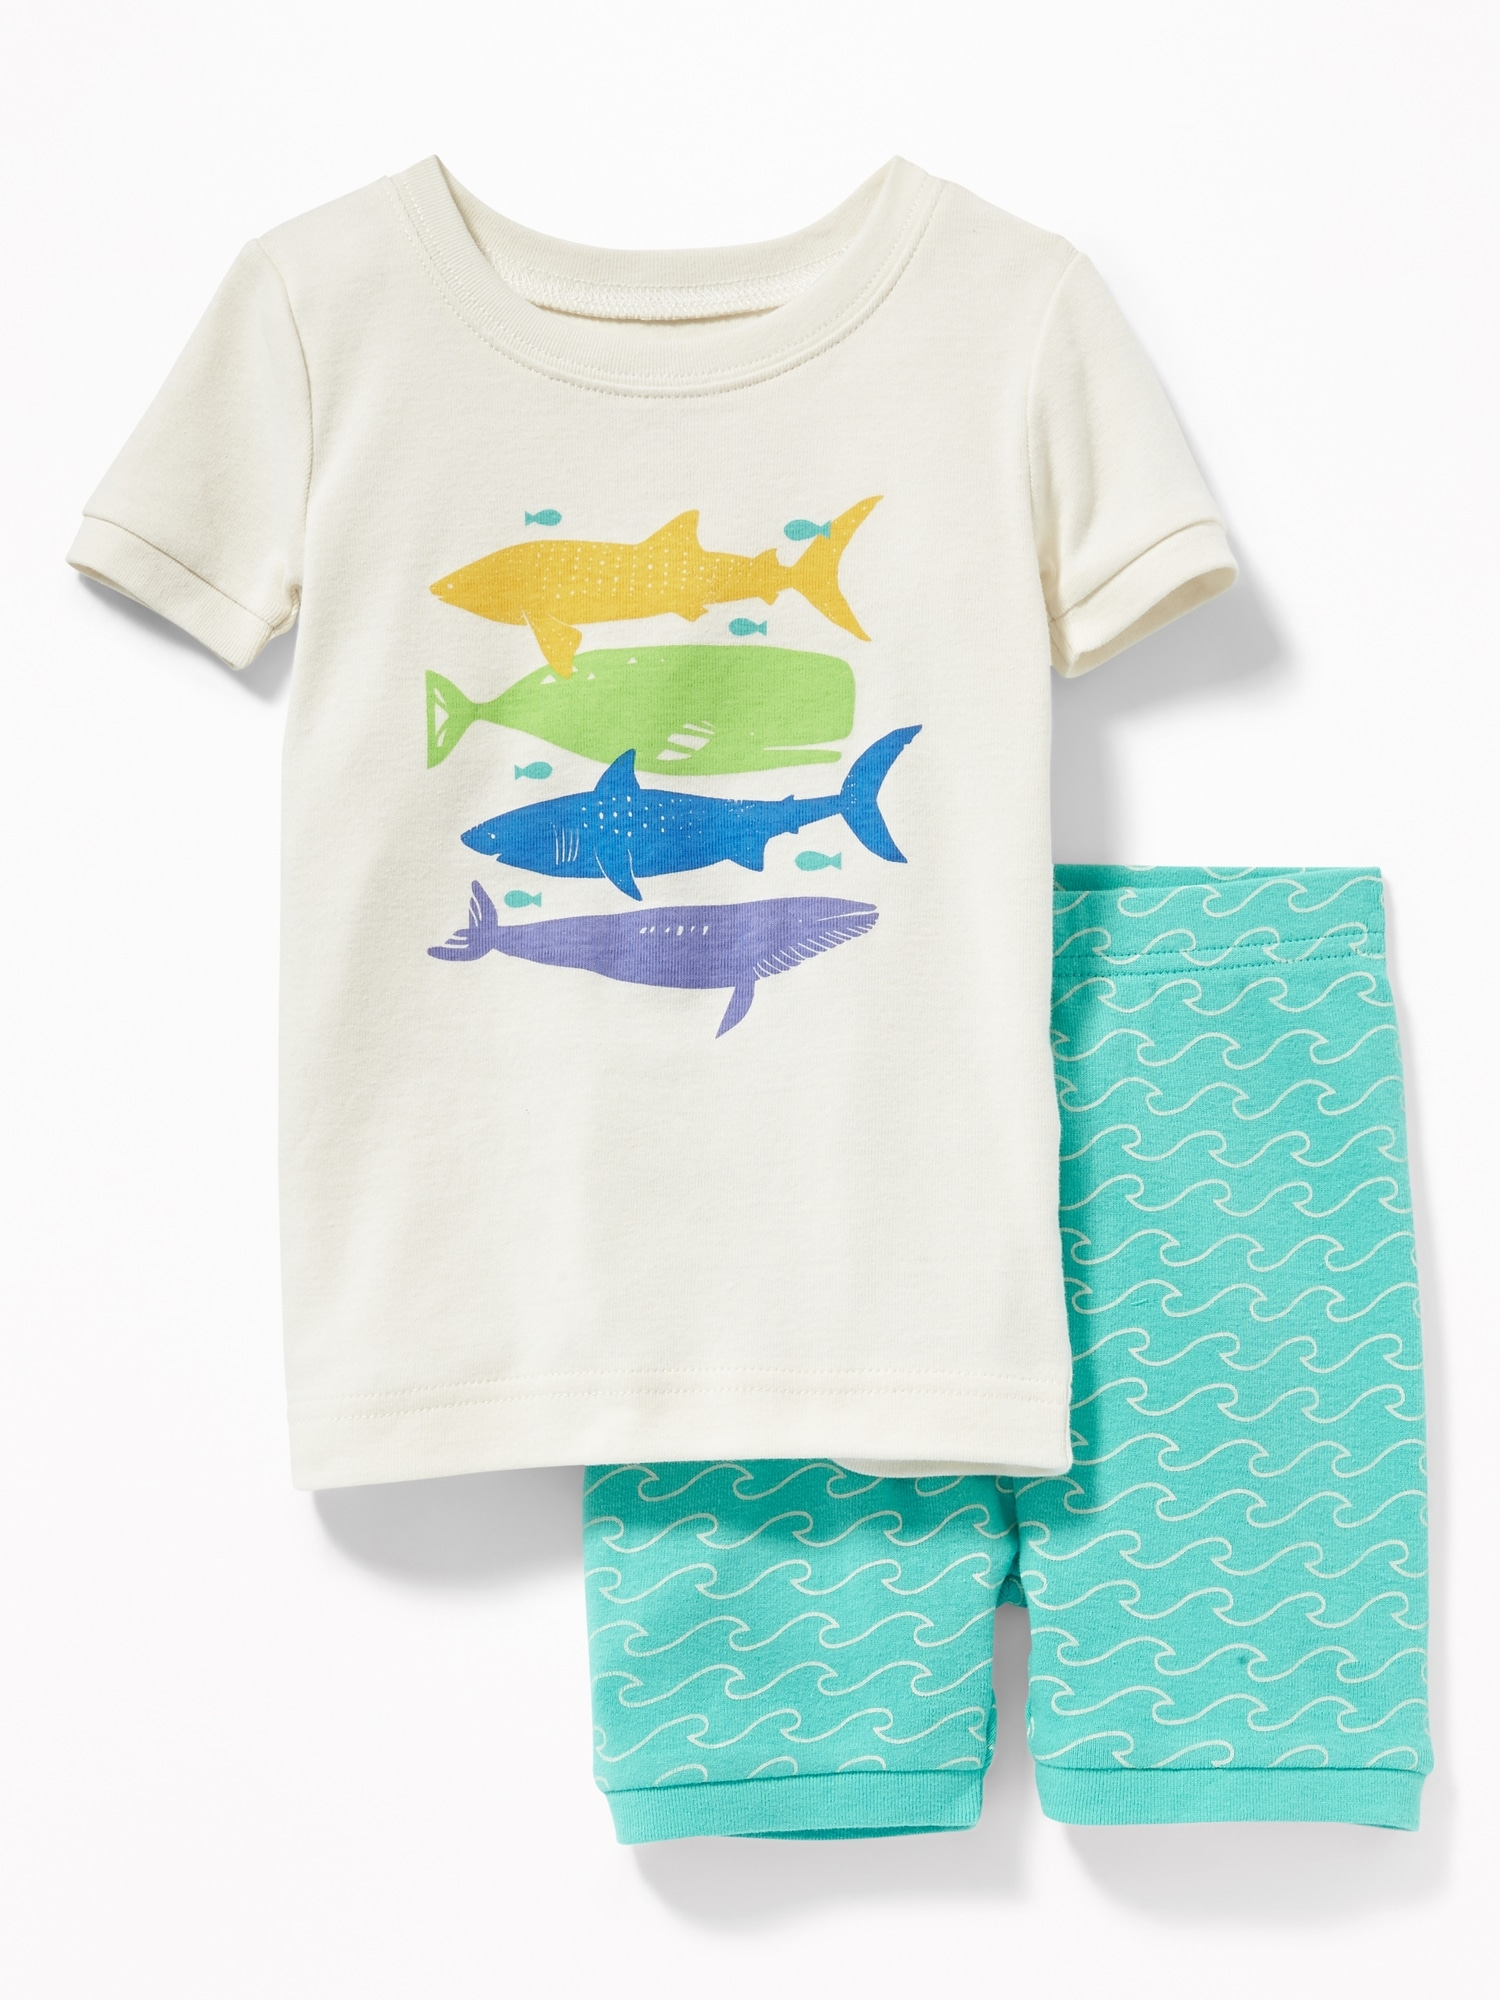 Baby Gap Pj/'s Boys Size 4 Short Sleeves /& Shorts Navy Sharks